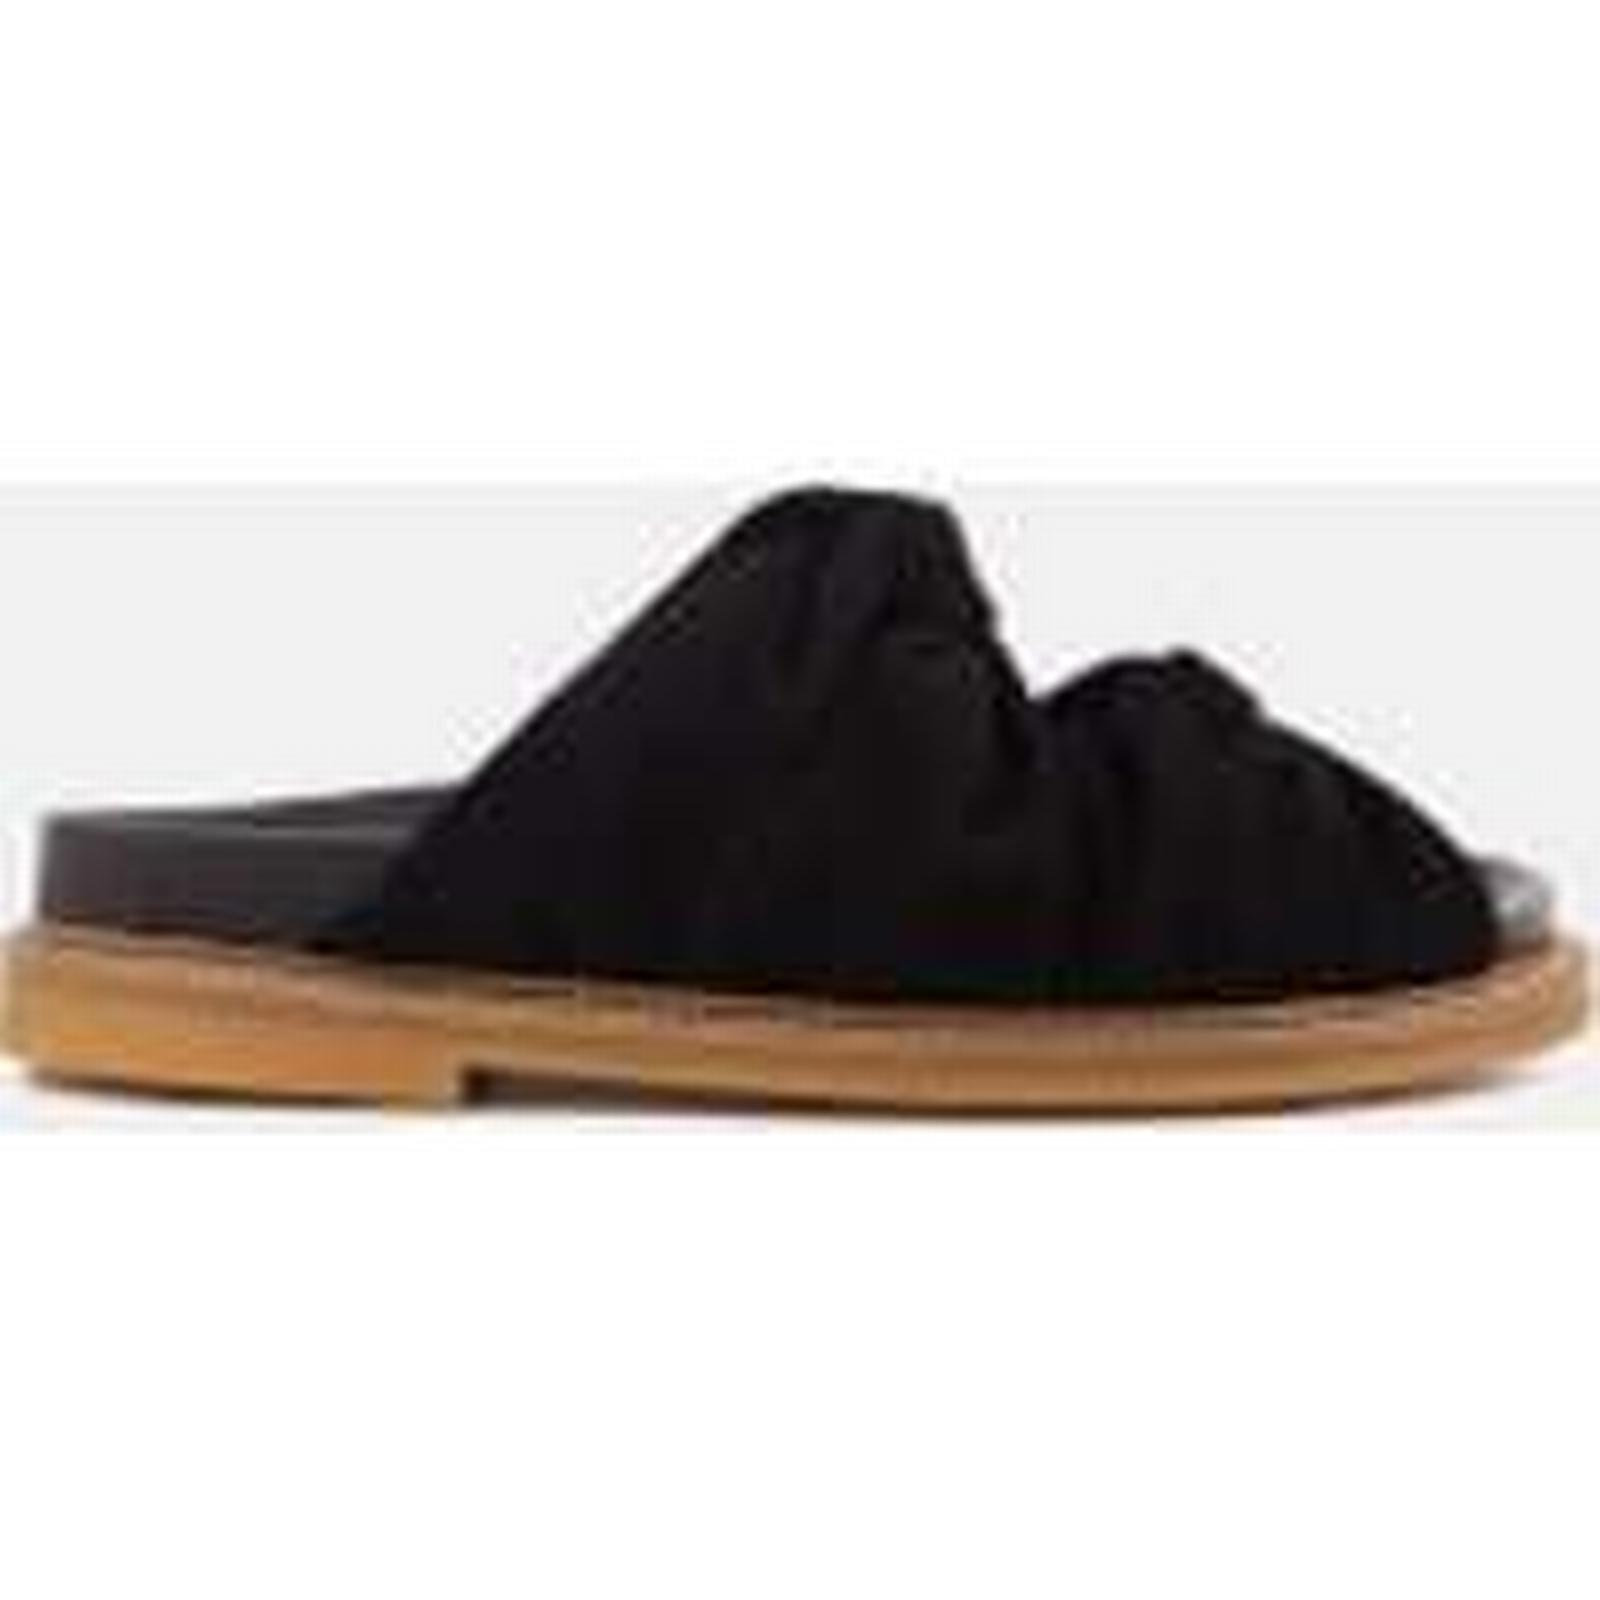 Ganni Women's Anoush Sandals - - Black - UK 3 - Sandals Black 610e2c